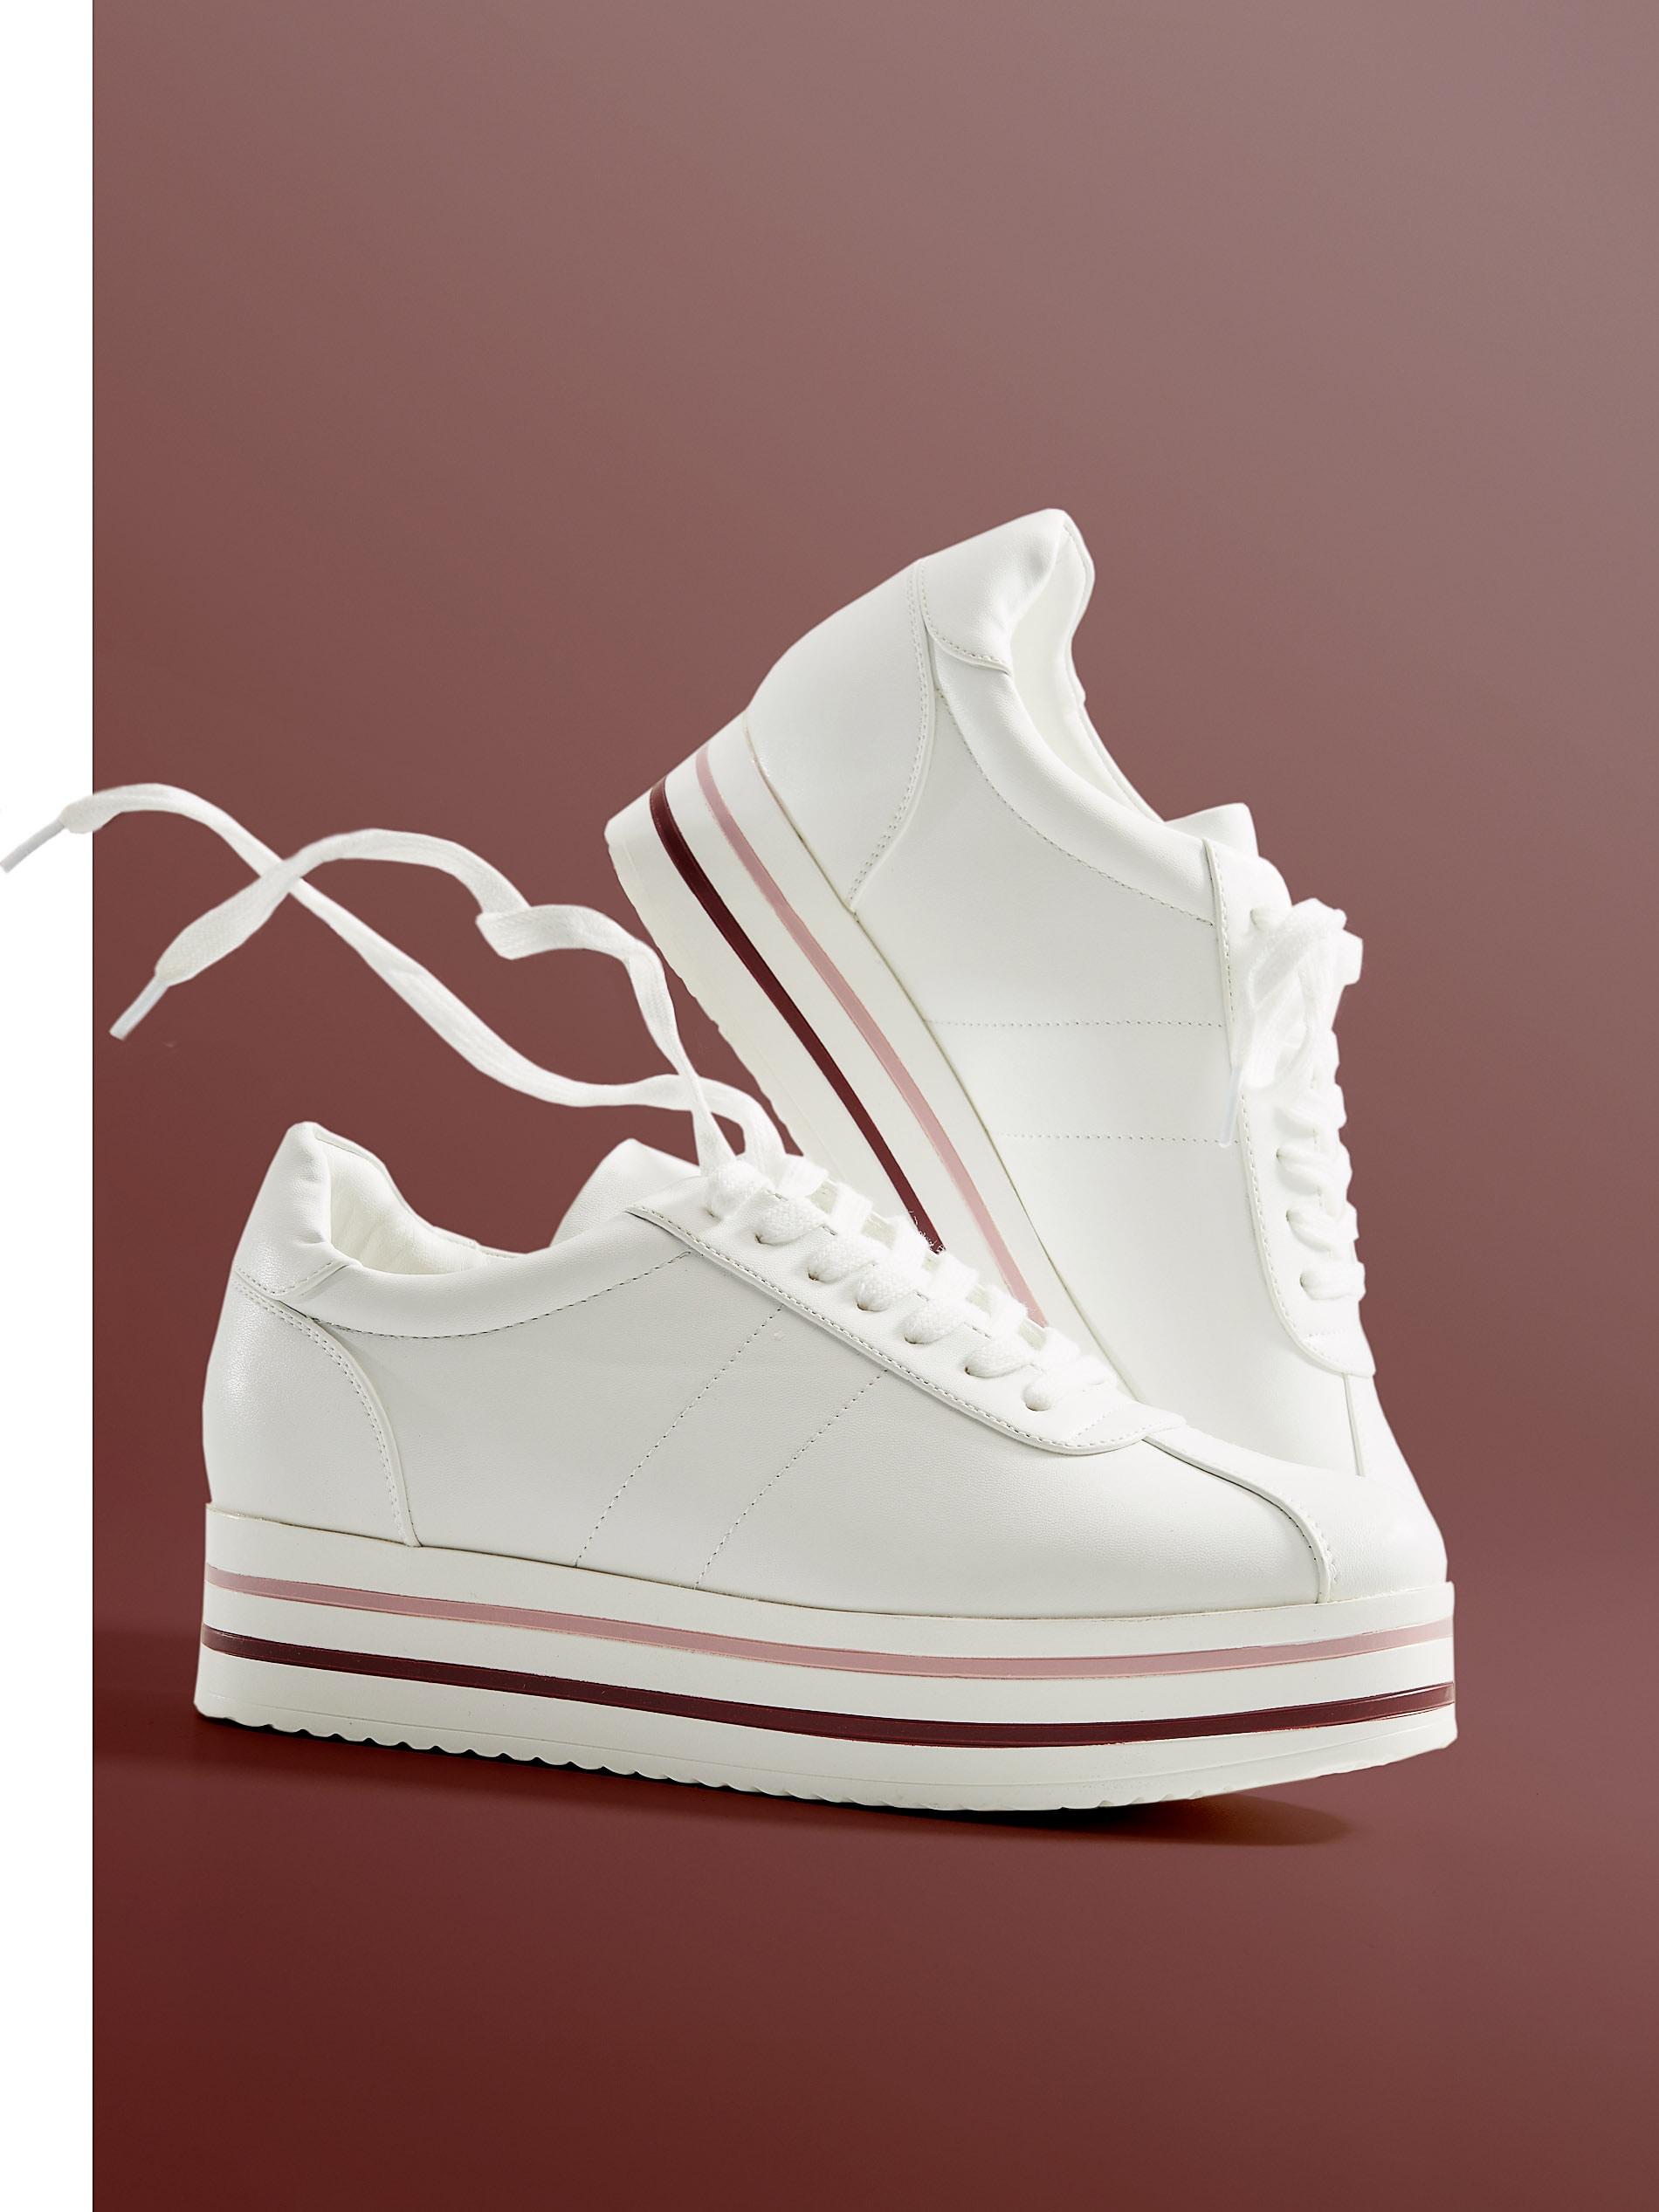 Telitalpú tornacipő - fehér - VN940-00X - Mohito - 2 5ea4142eb9